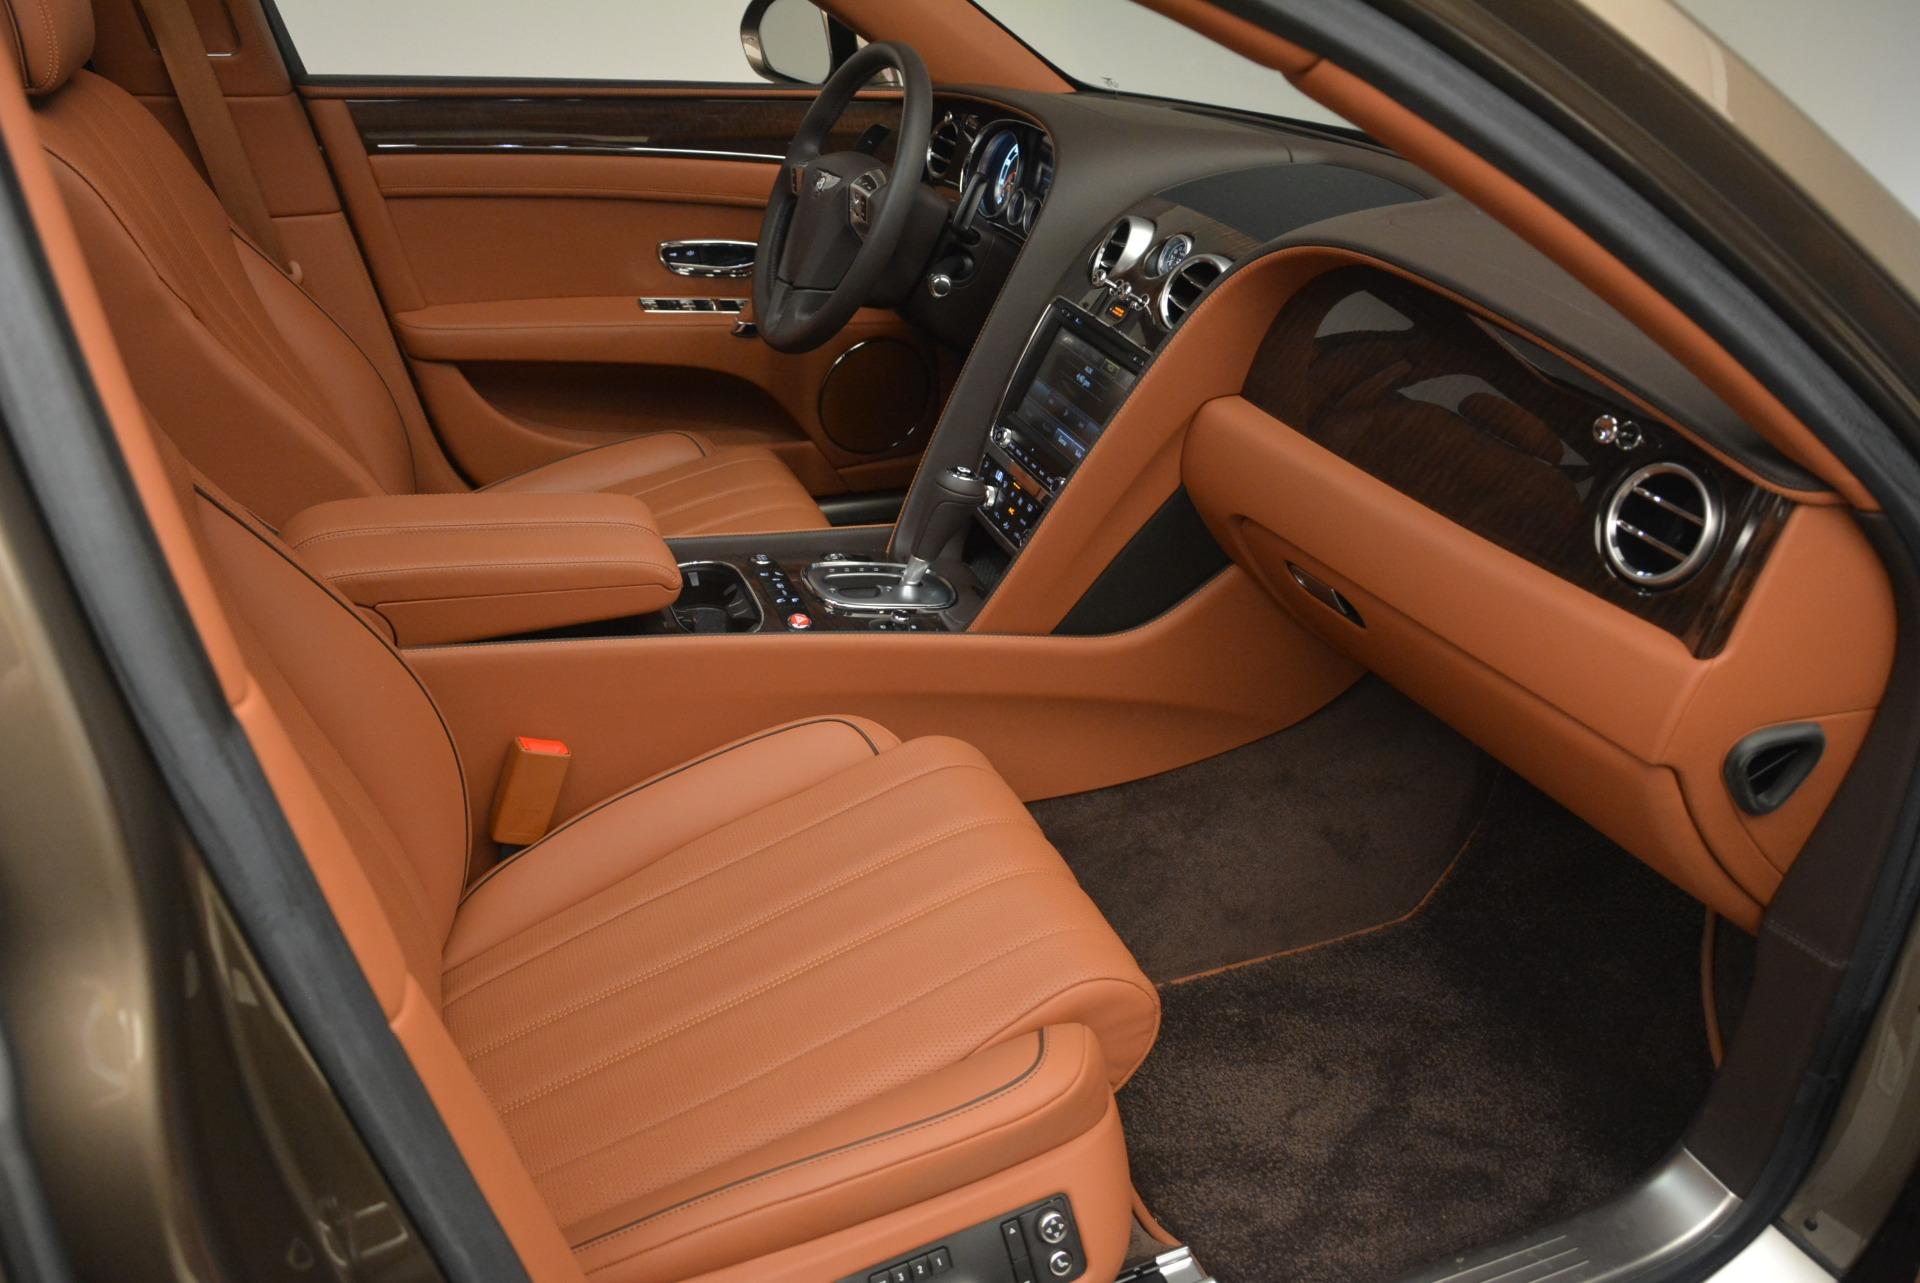 Used 2015 Bentley Flying Spur W12 For Sale In Westport, CT 2266_p23